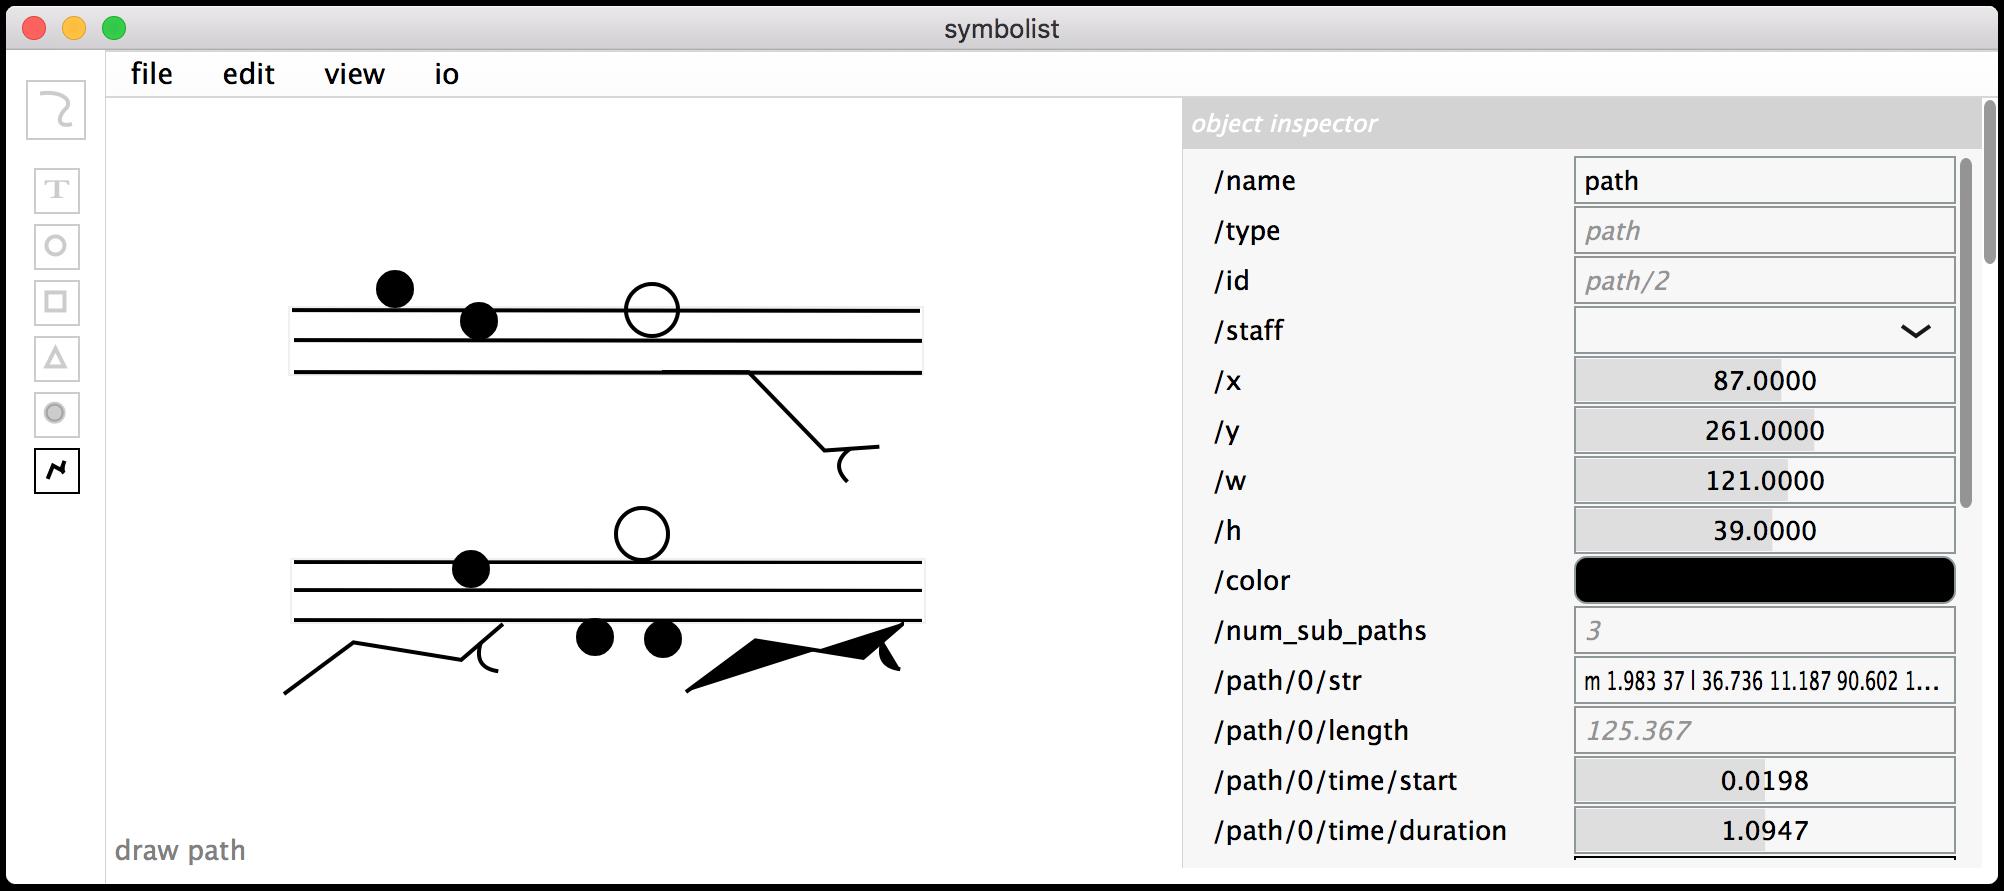 notation-symbolist.png